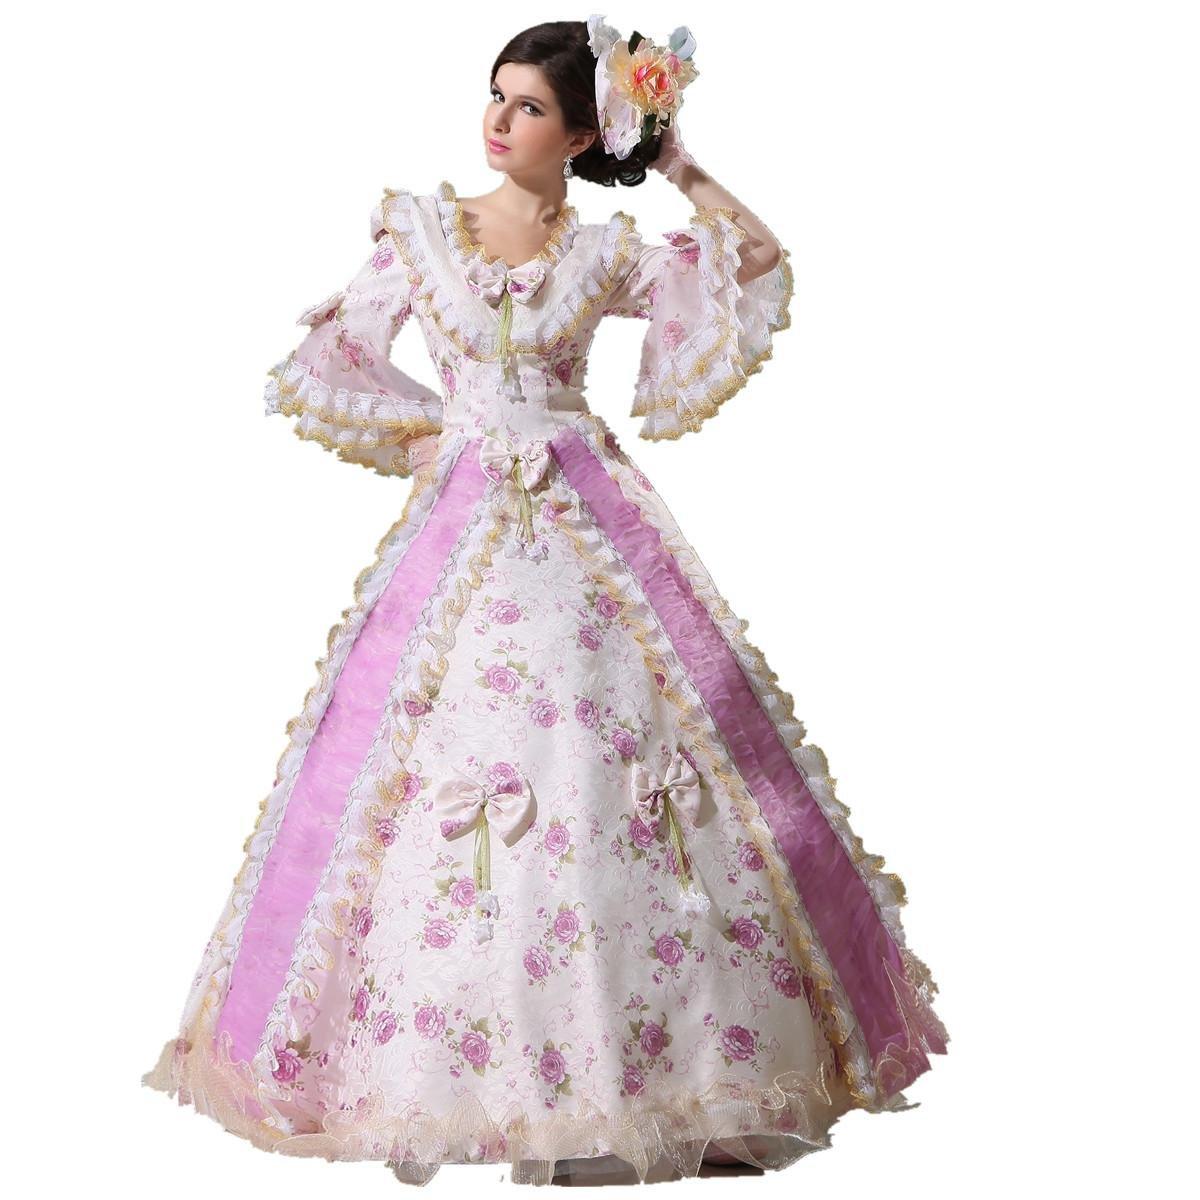 Карнавальный костюм mingsha Women's Marie Antoinette 17-18th Century Rococo Baroque Gown